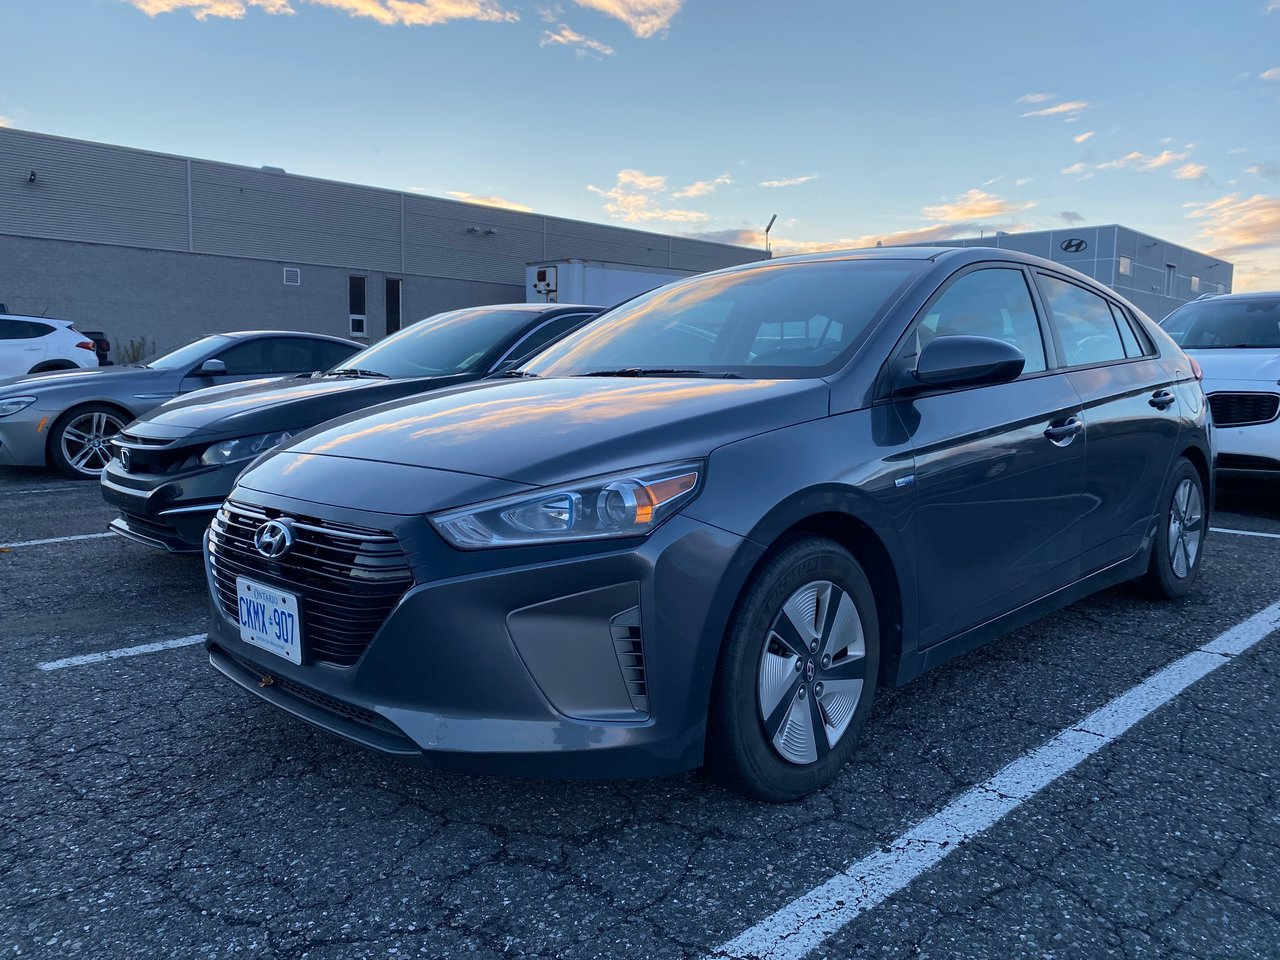 Hyundai IONIQ 2019 Essential